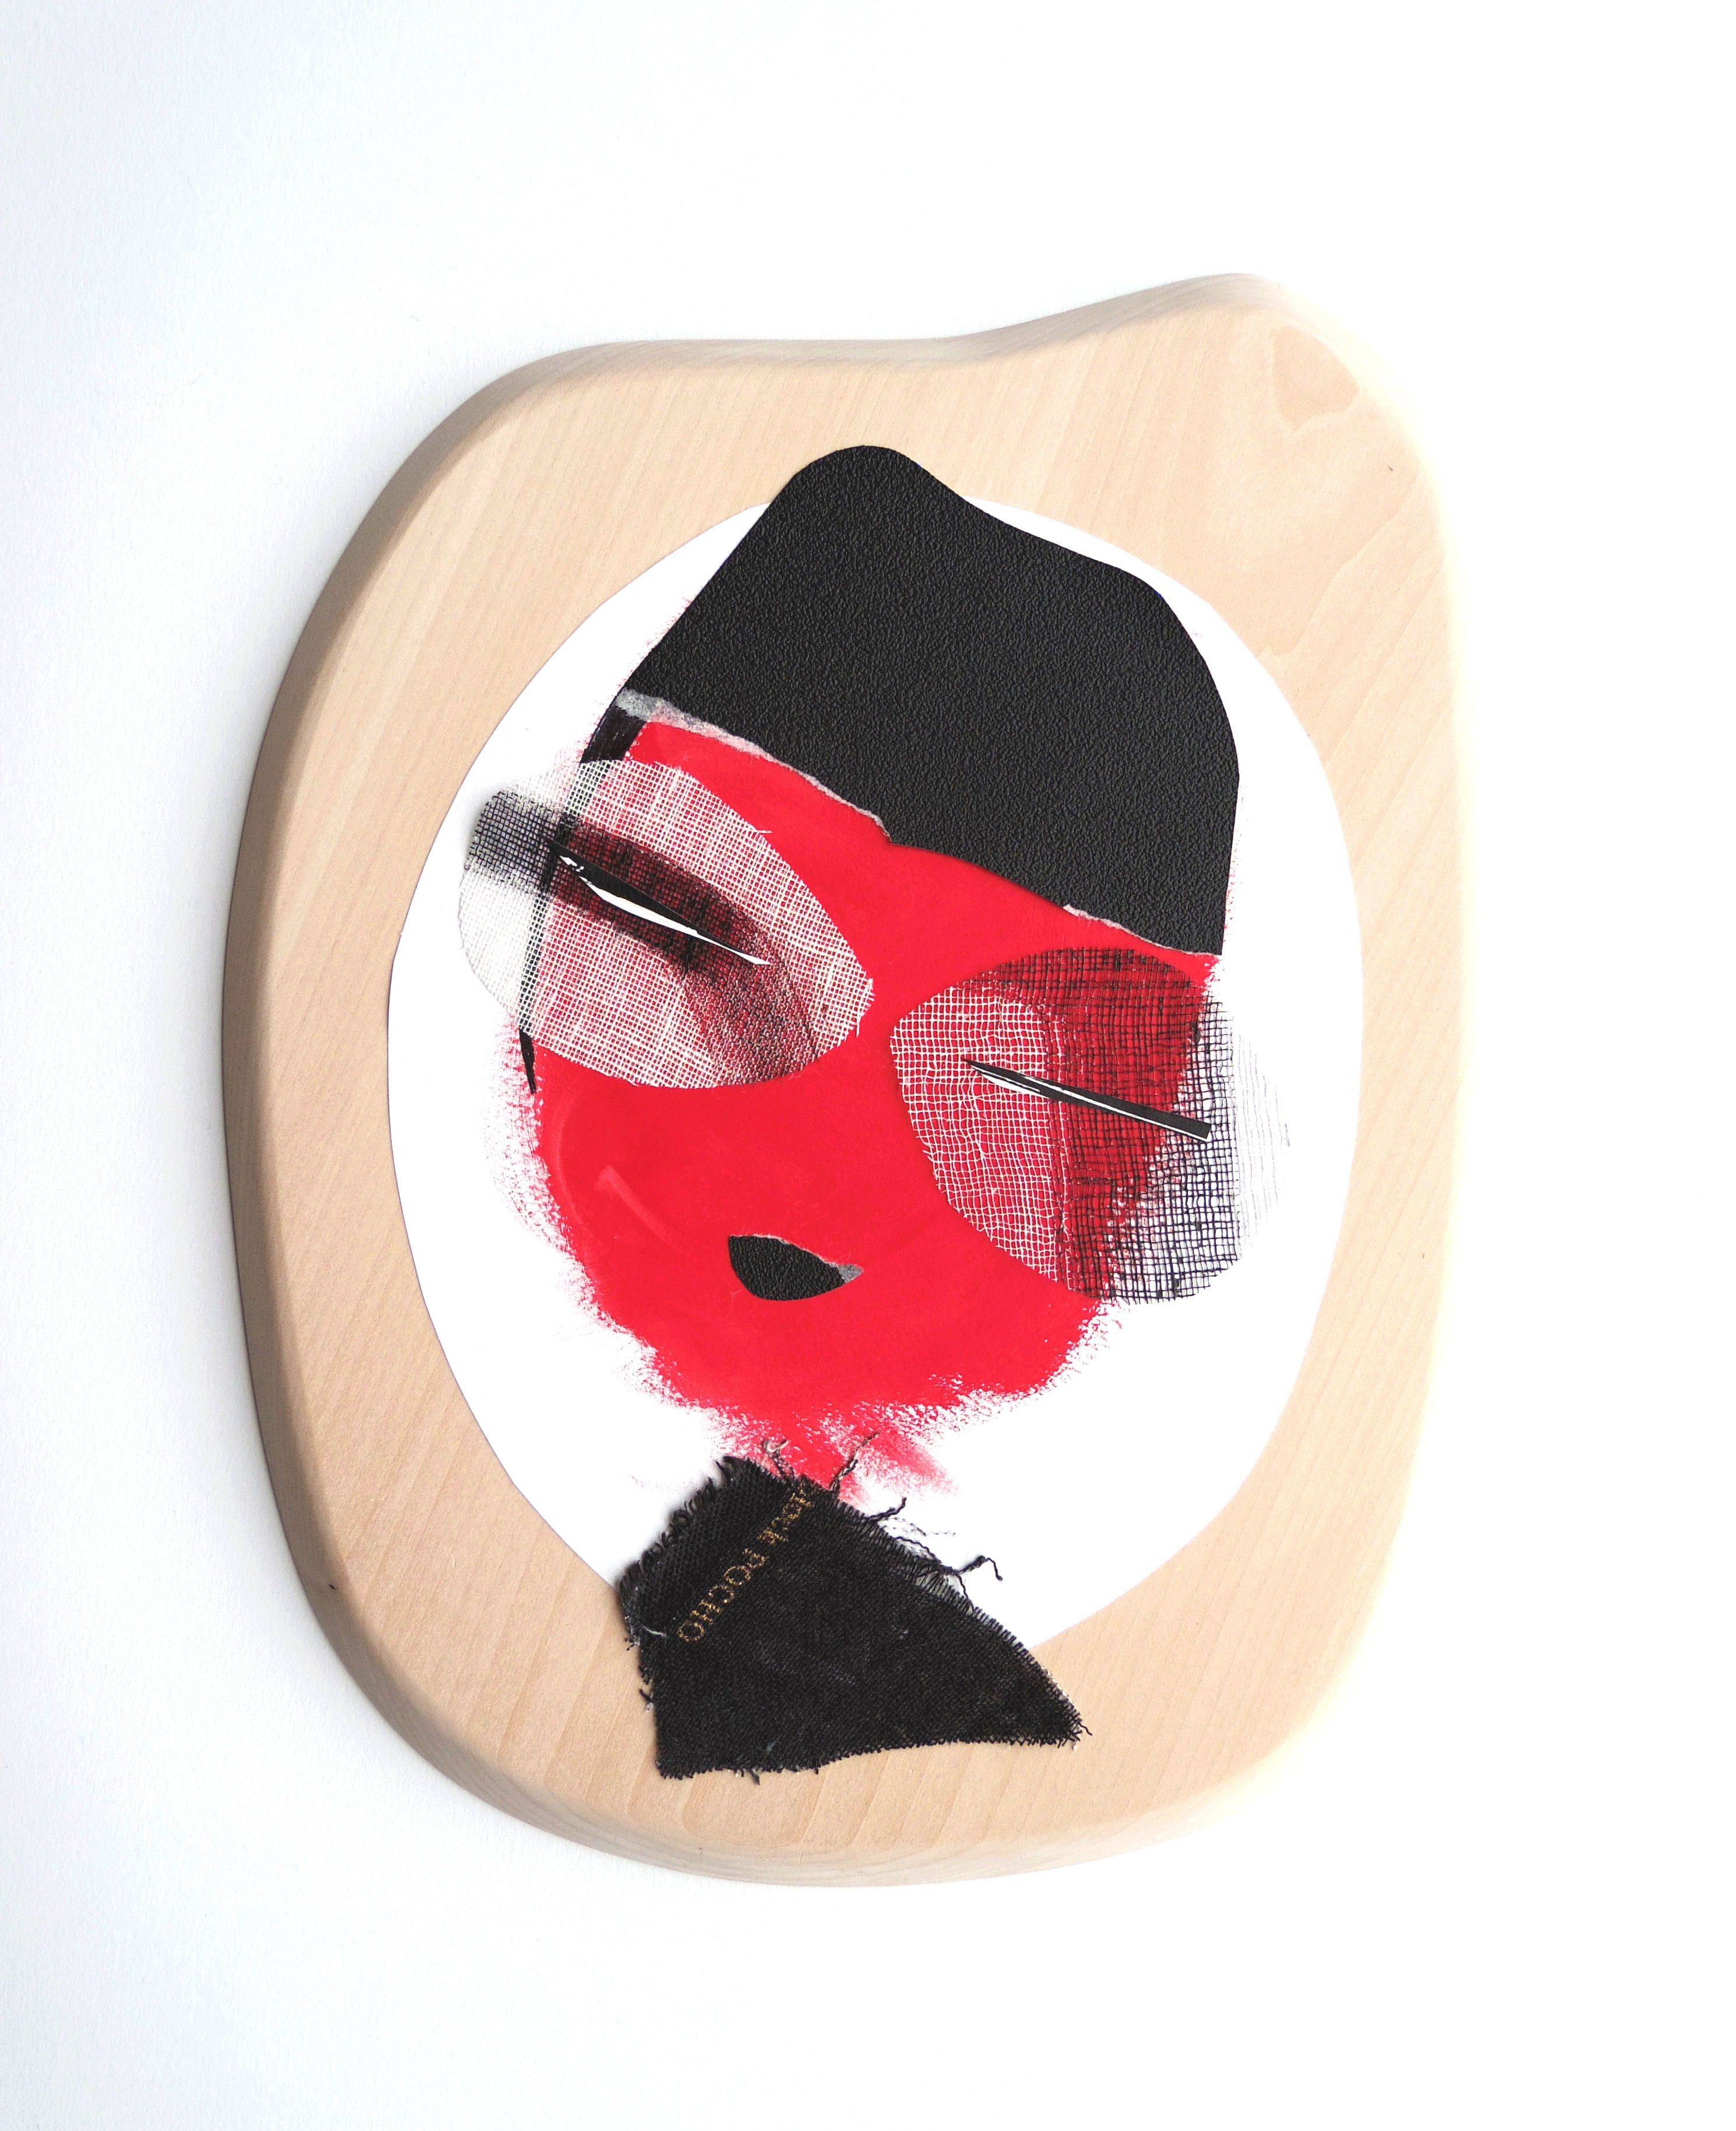 KaT On wood... Wood - fabrics -paper - painting http://katartworks.blogspot.fr